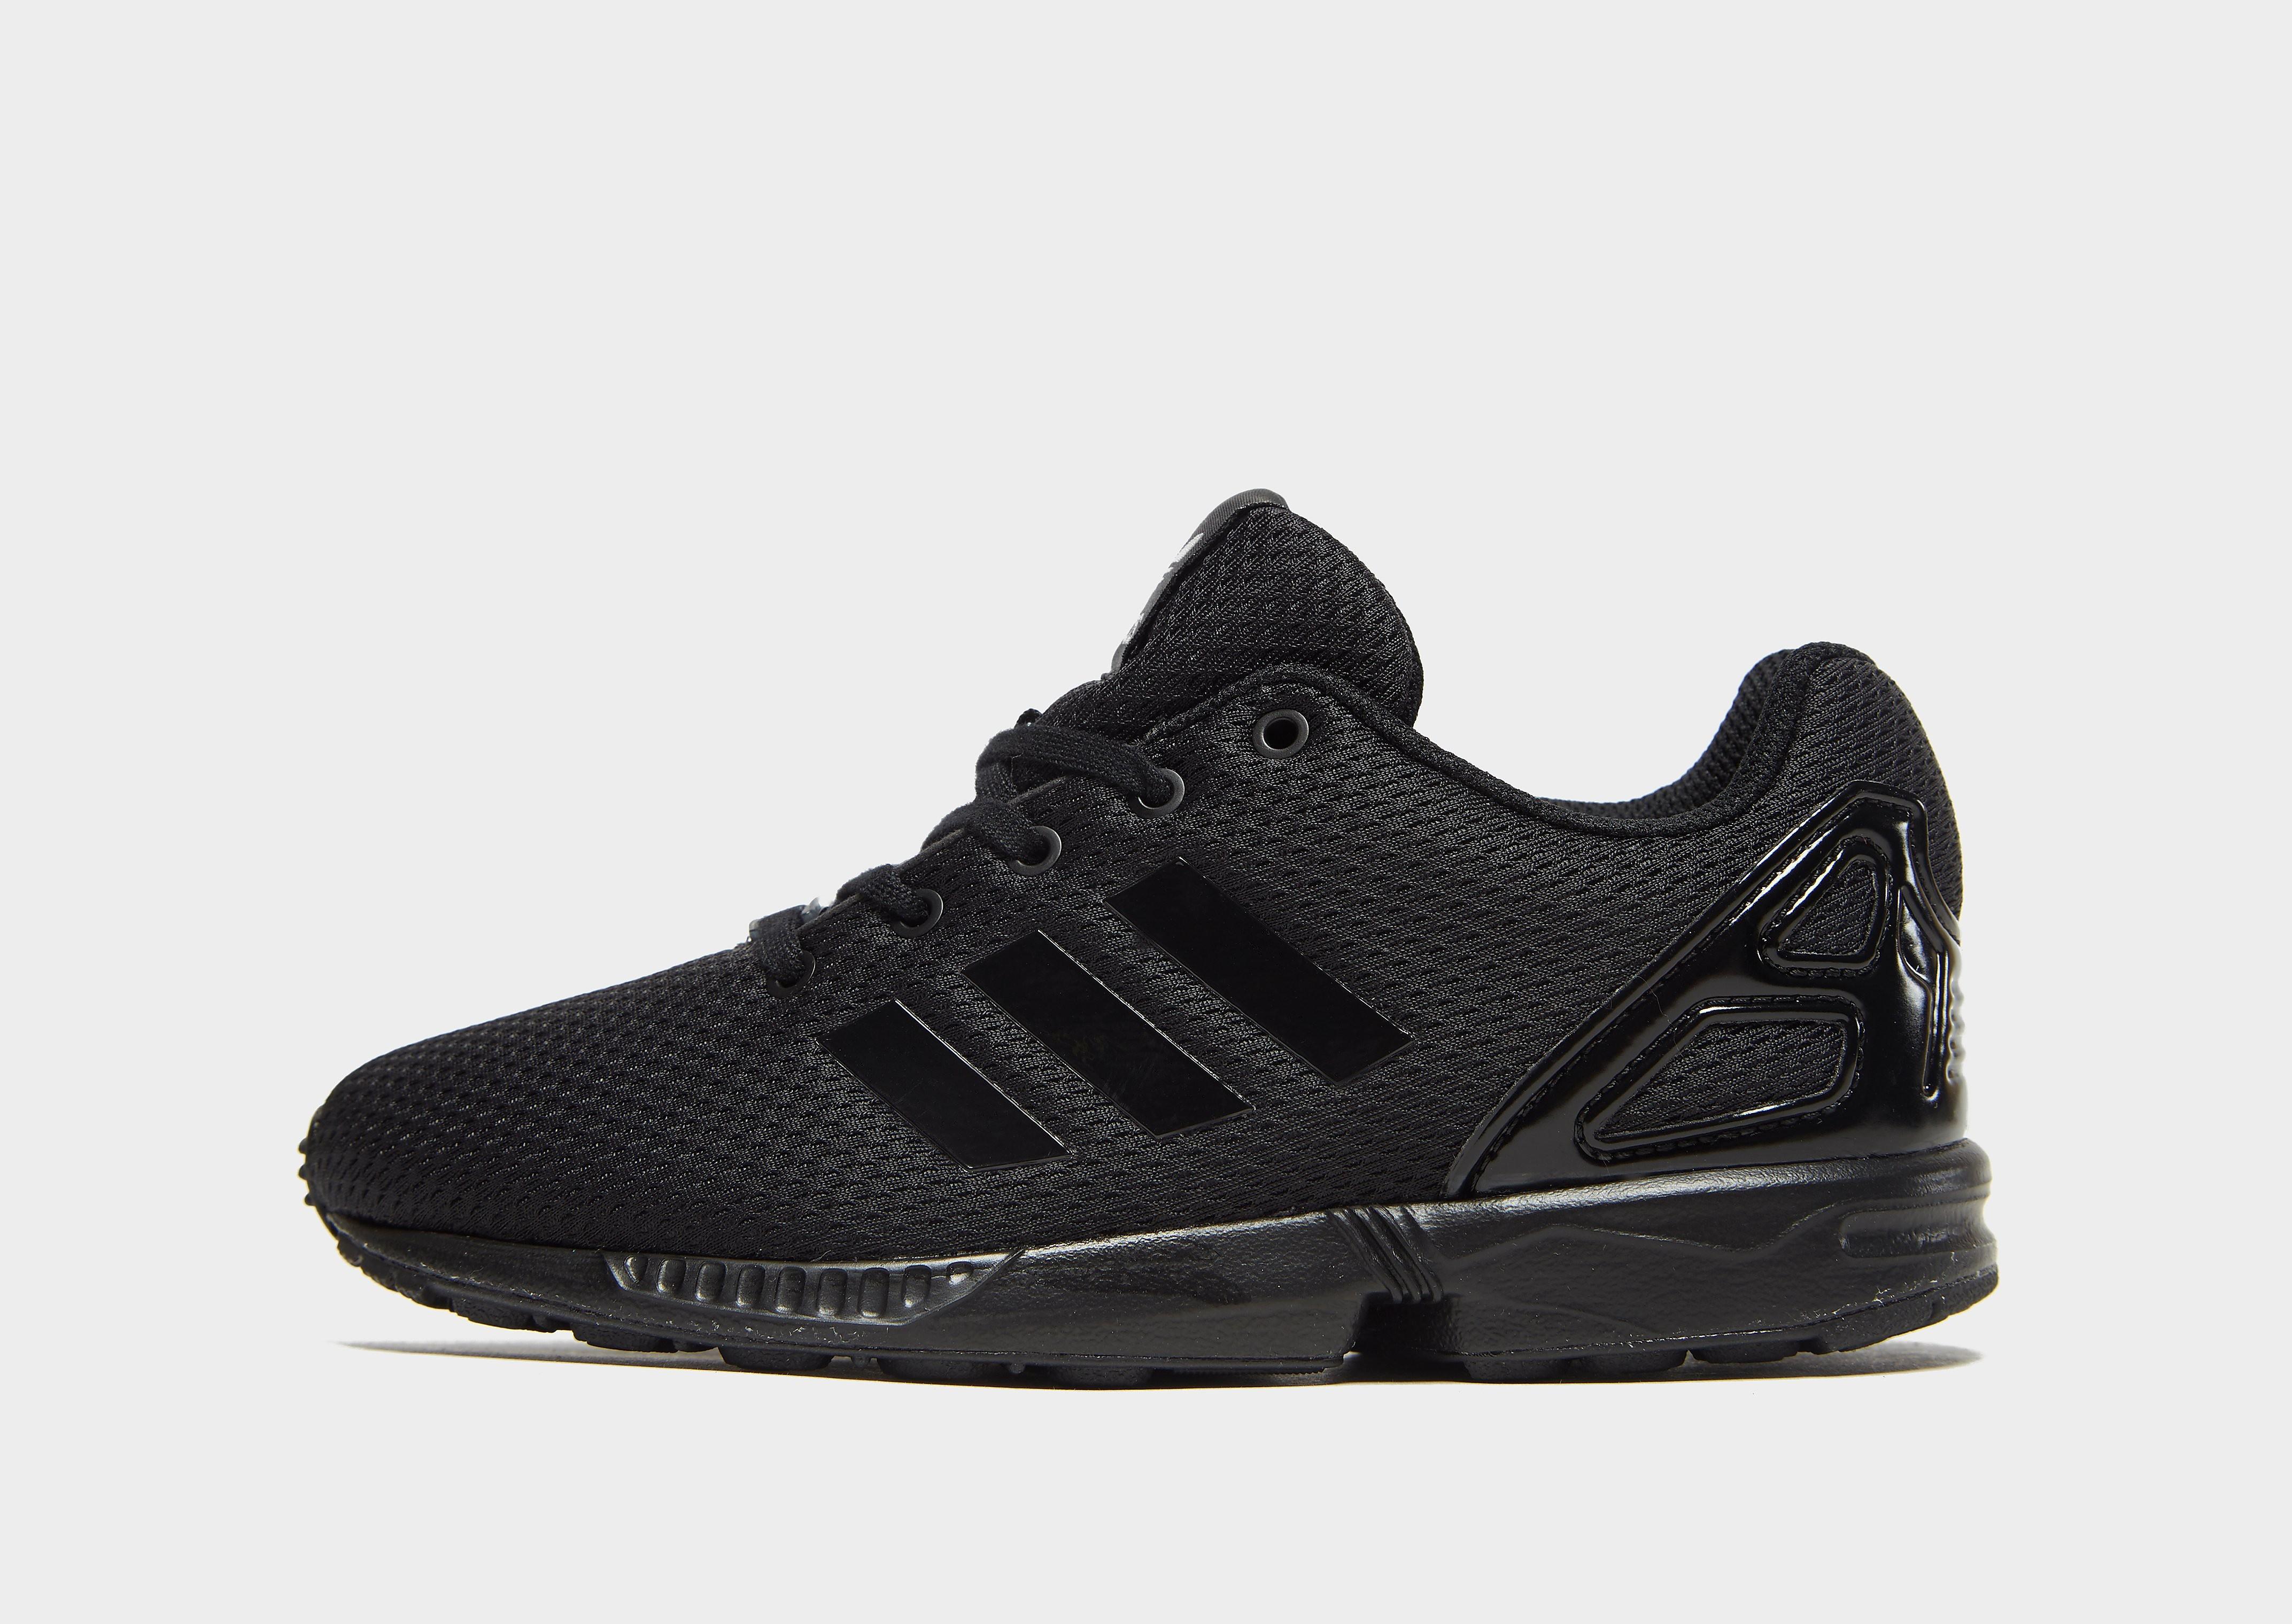 Adidas ZX Flux kindersneaker zwart